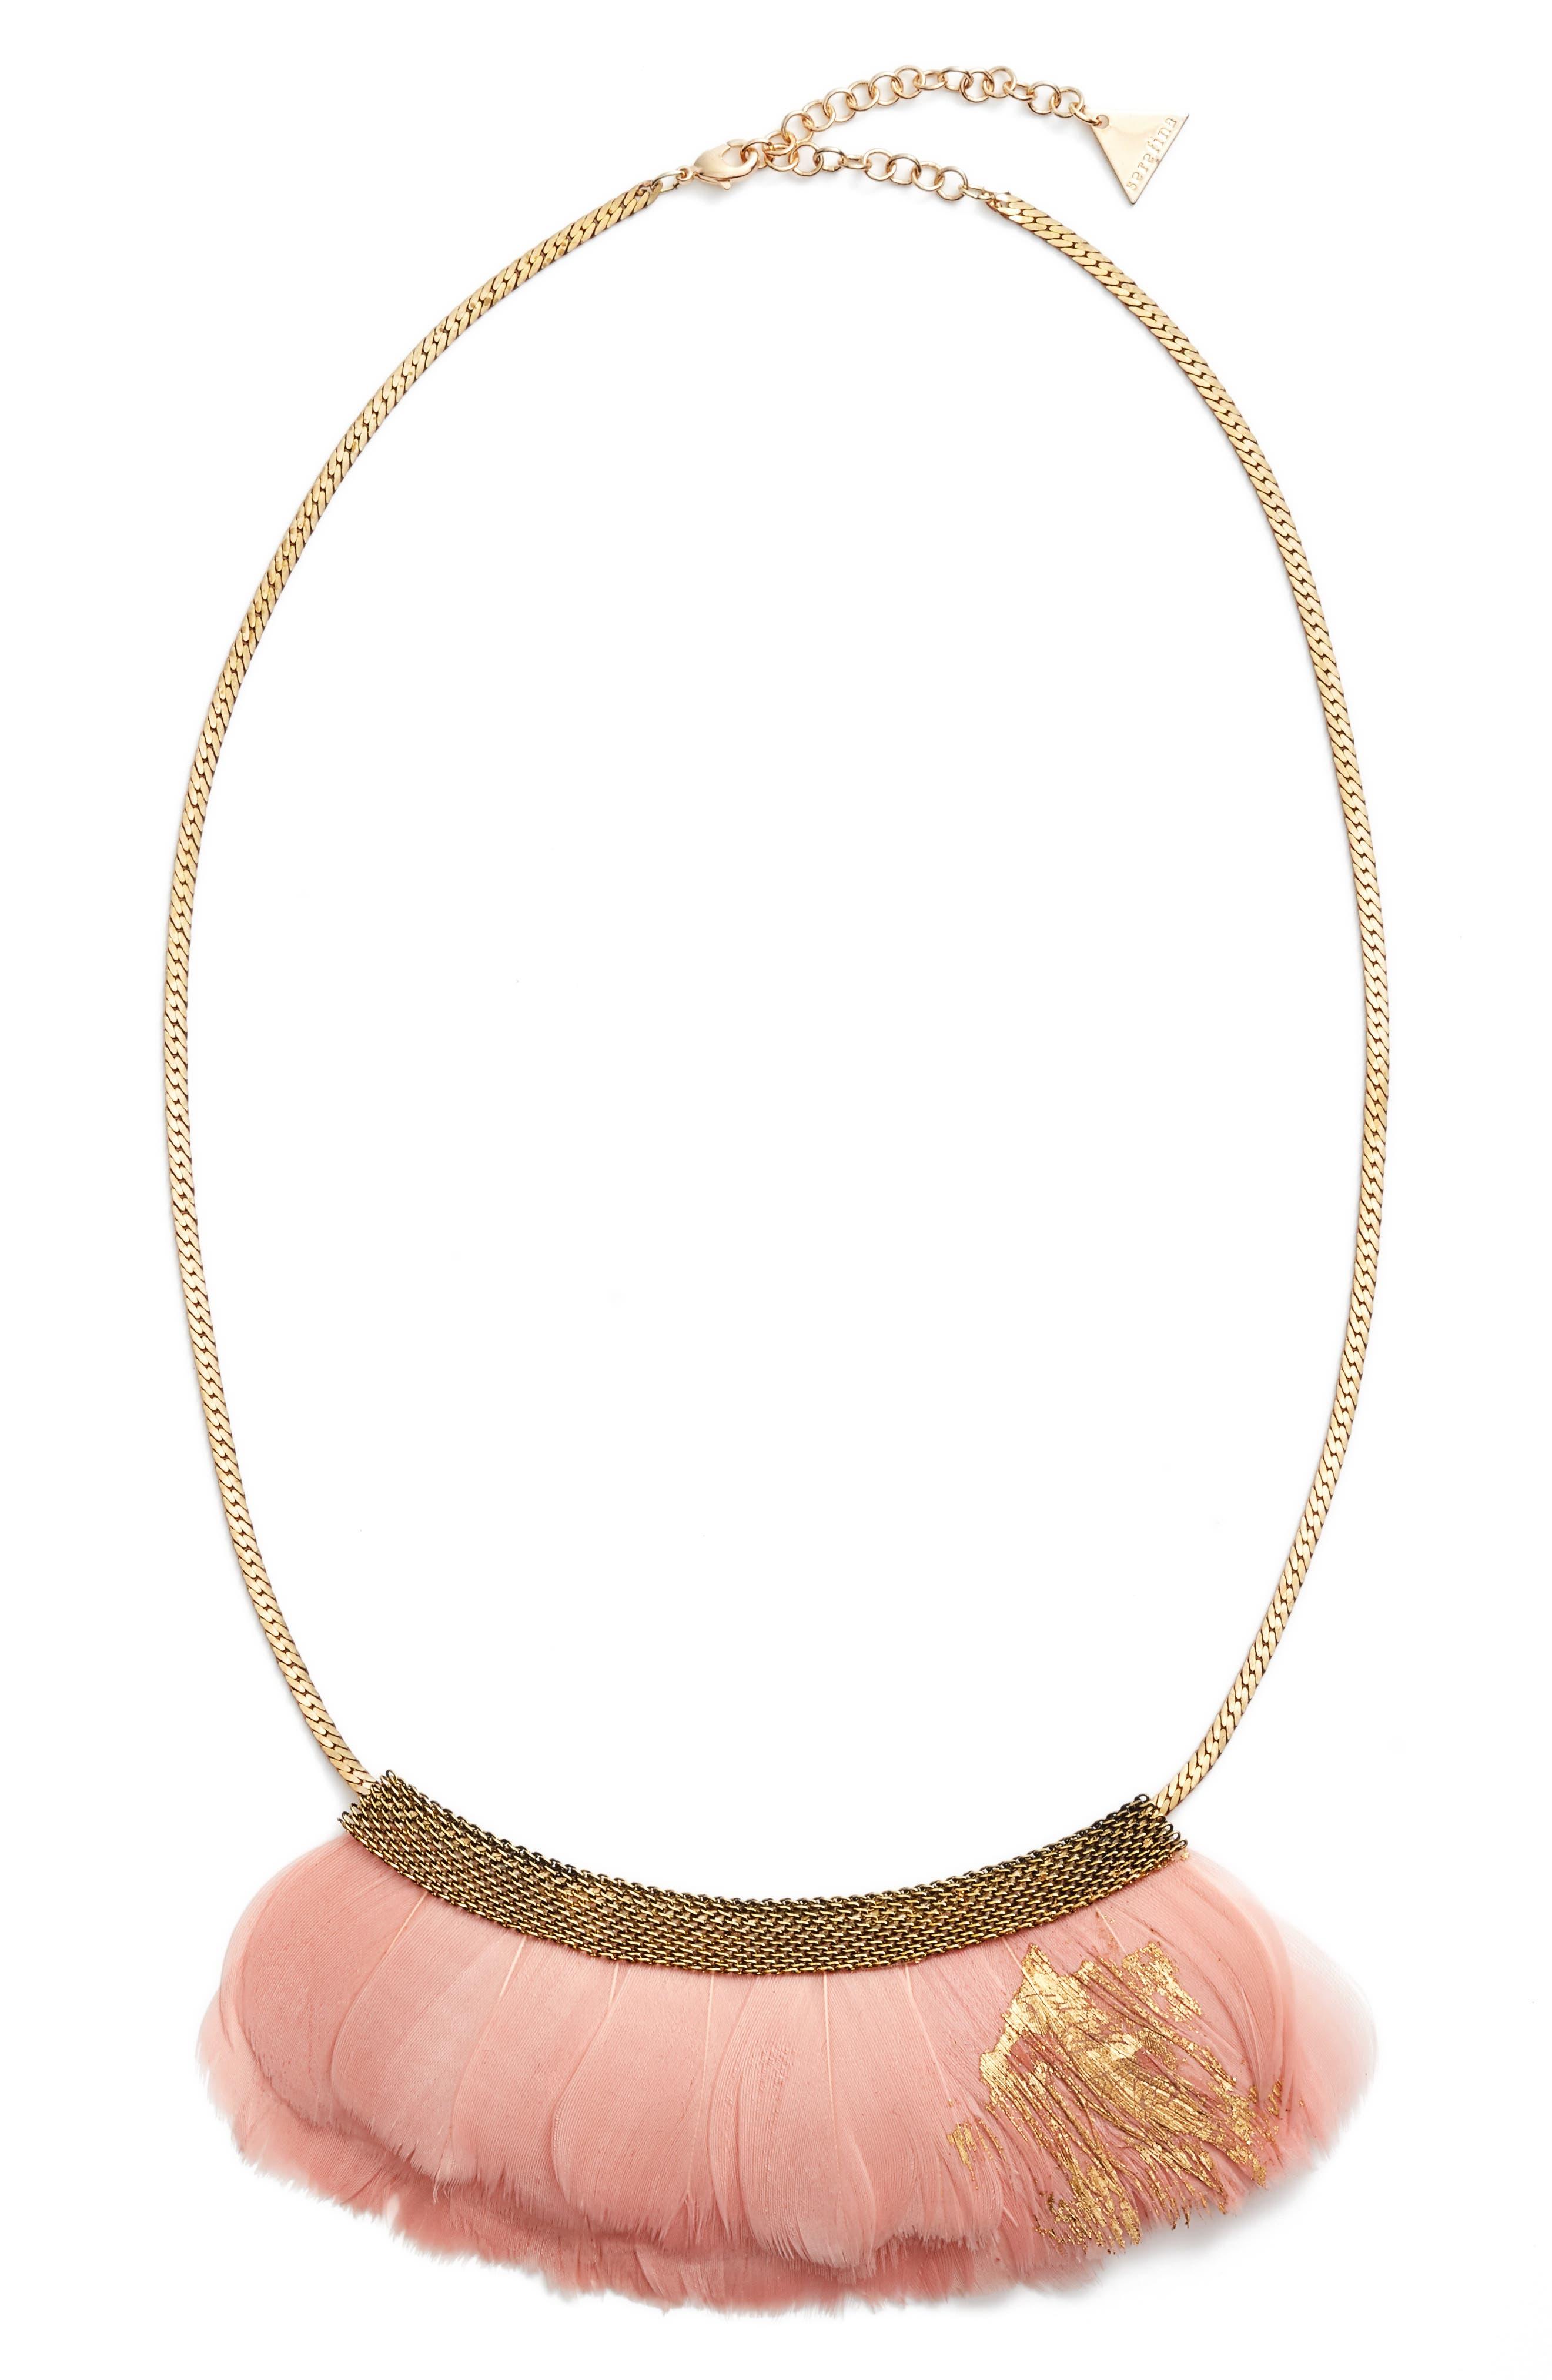 Main Image - Serefina Feather Bib Necklace